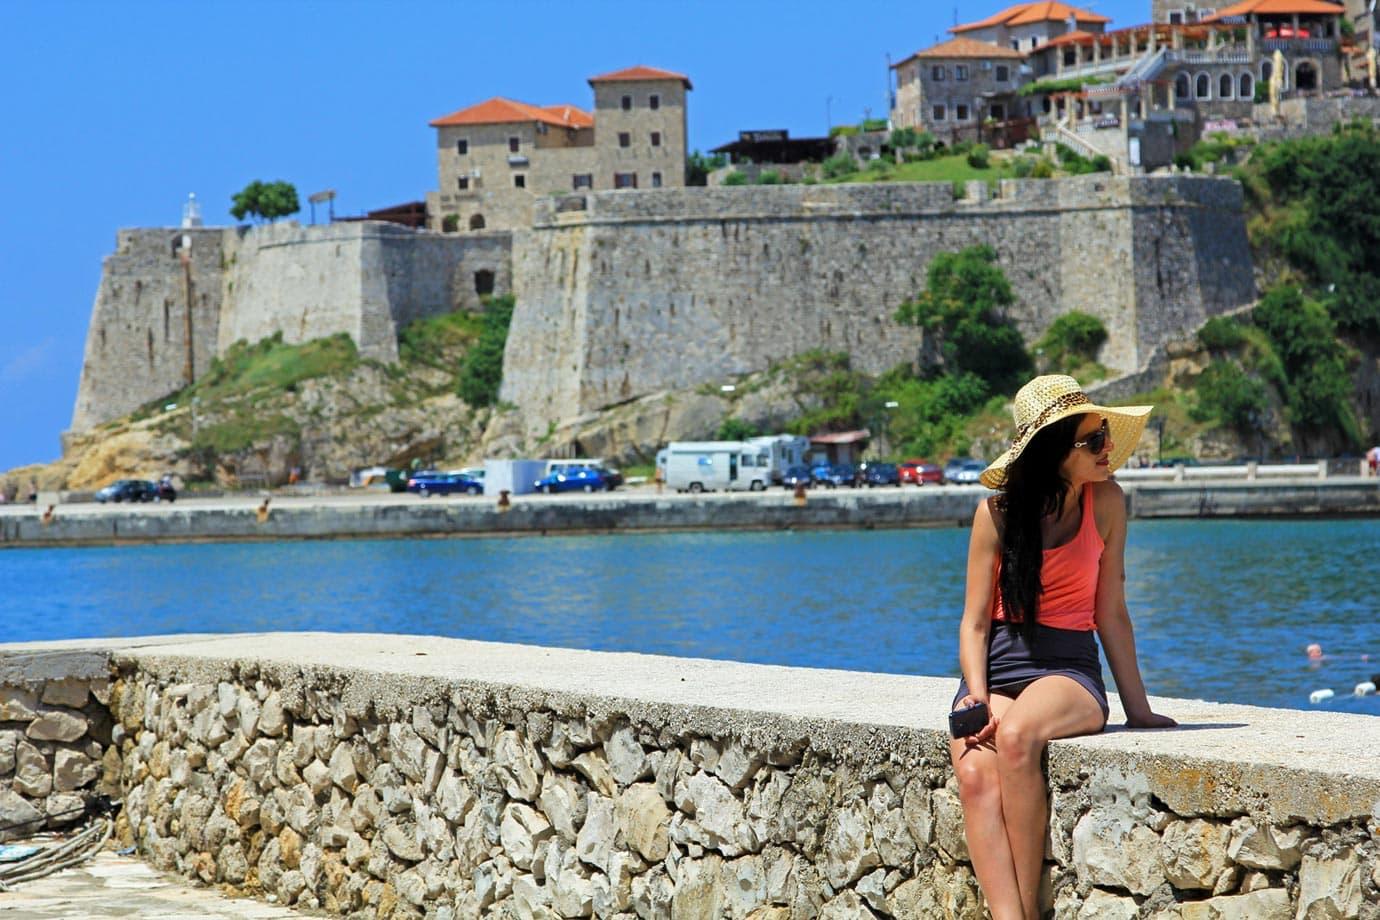 The majority of people living in Ulcinj are Albanian